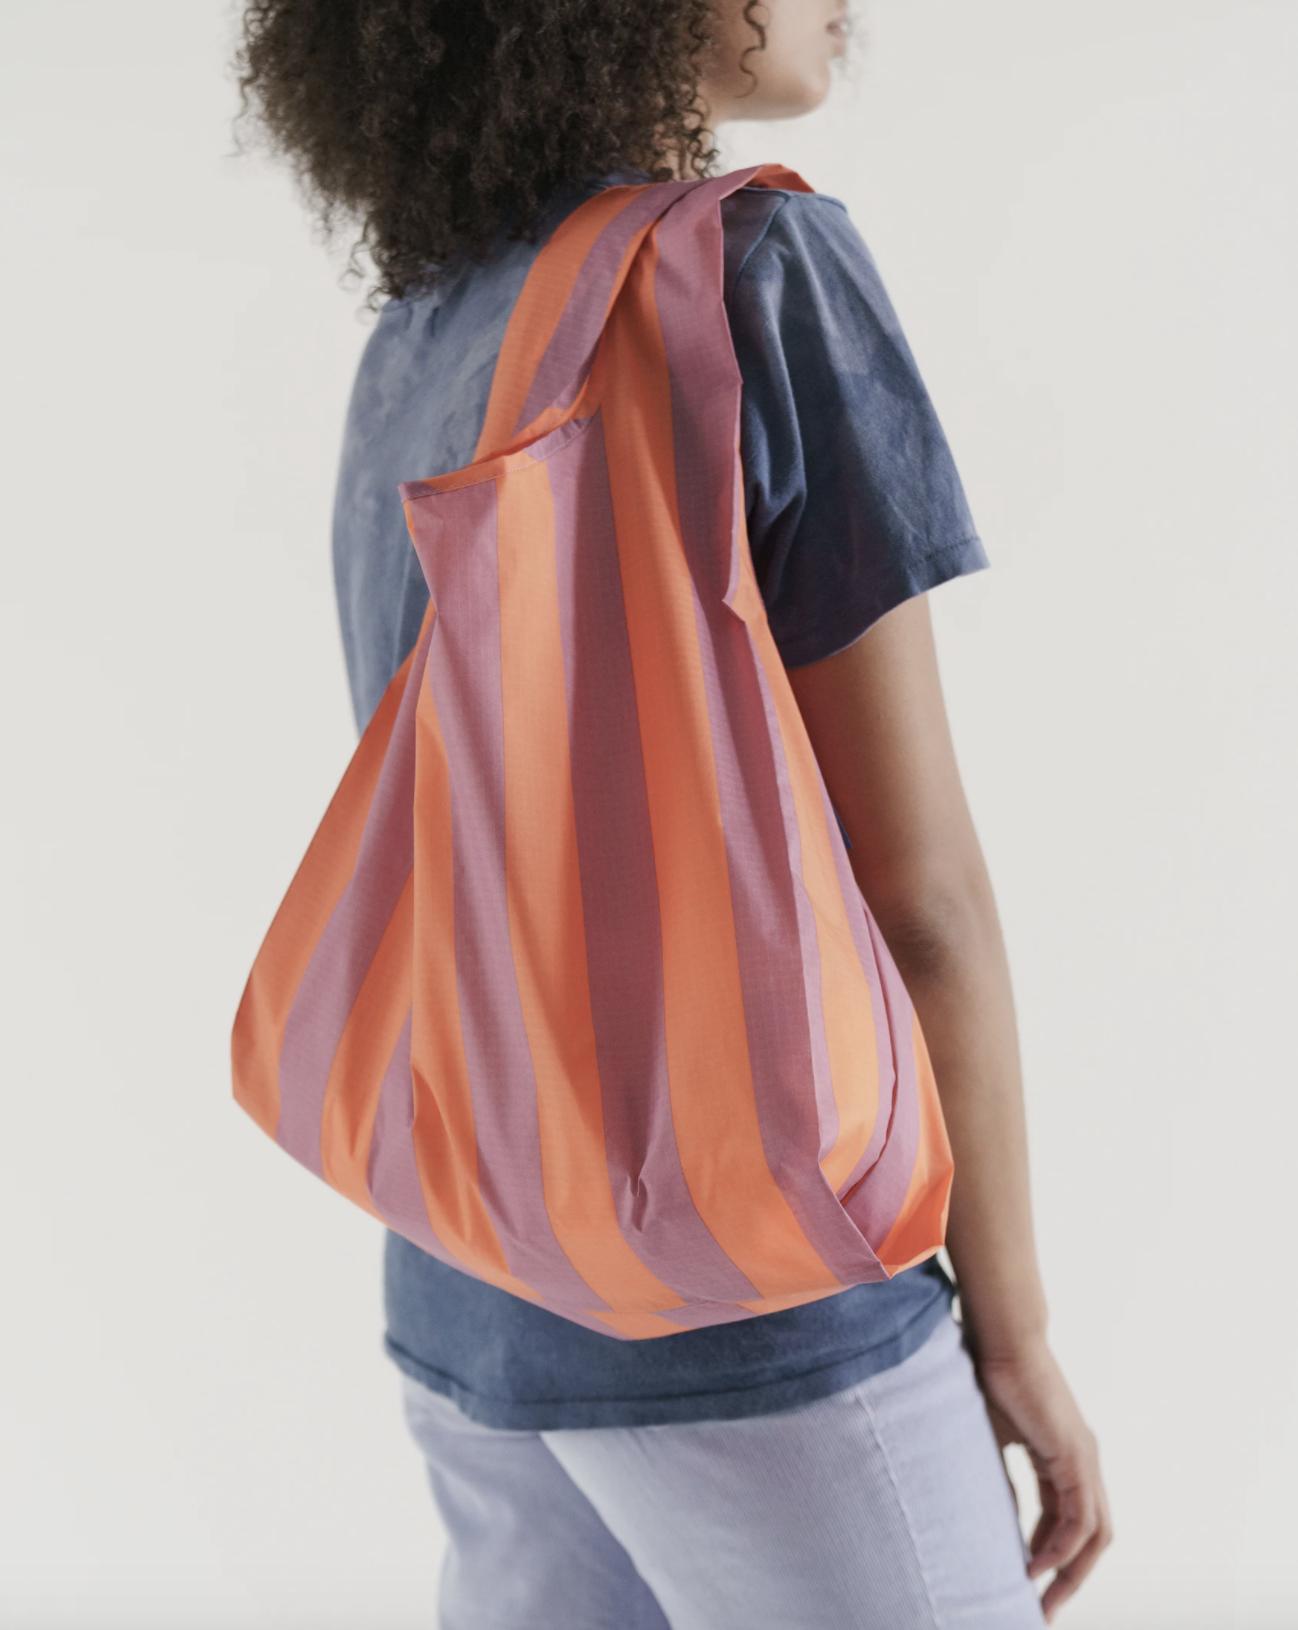 BAGGU - Stripe-Orange and Mauve